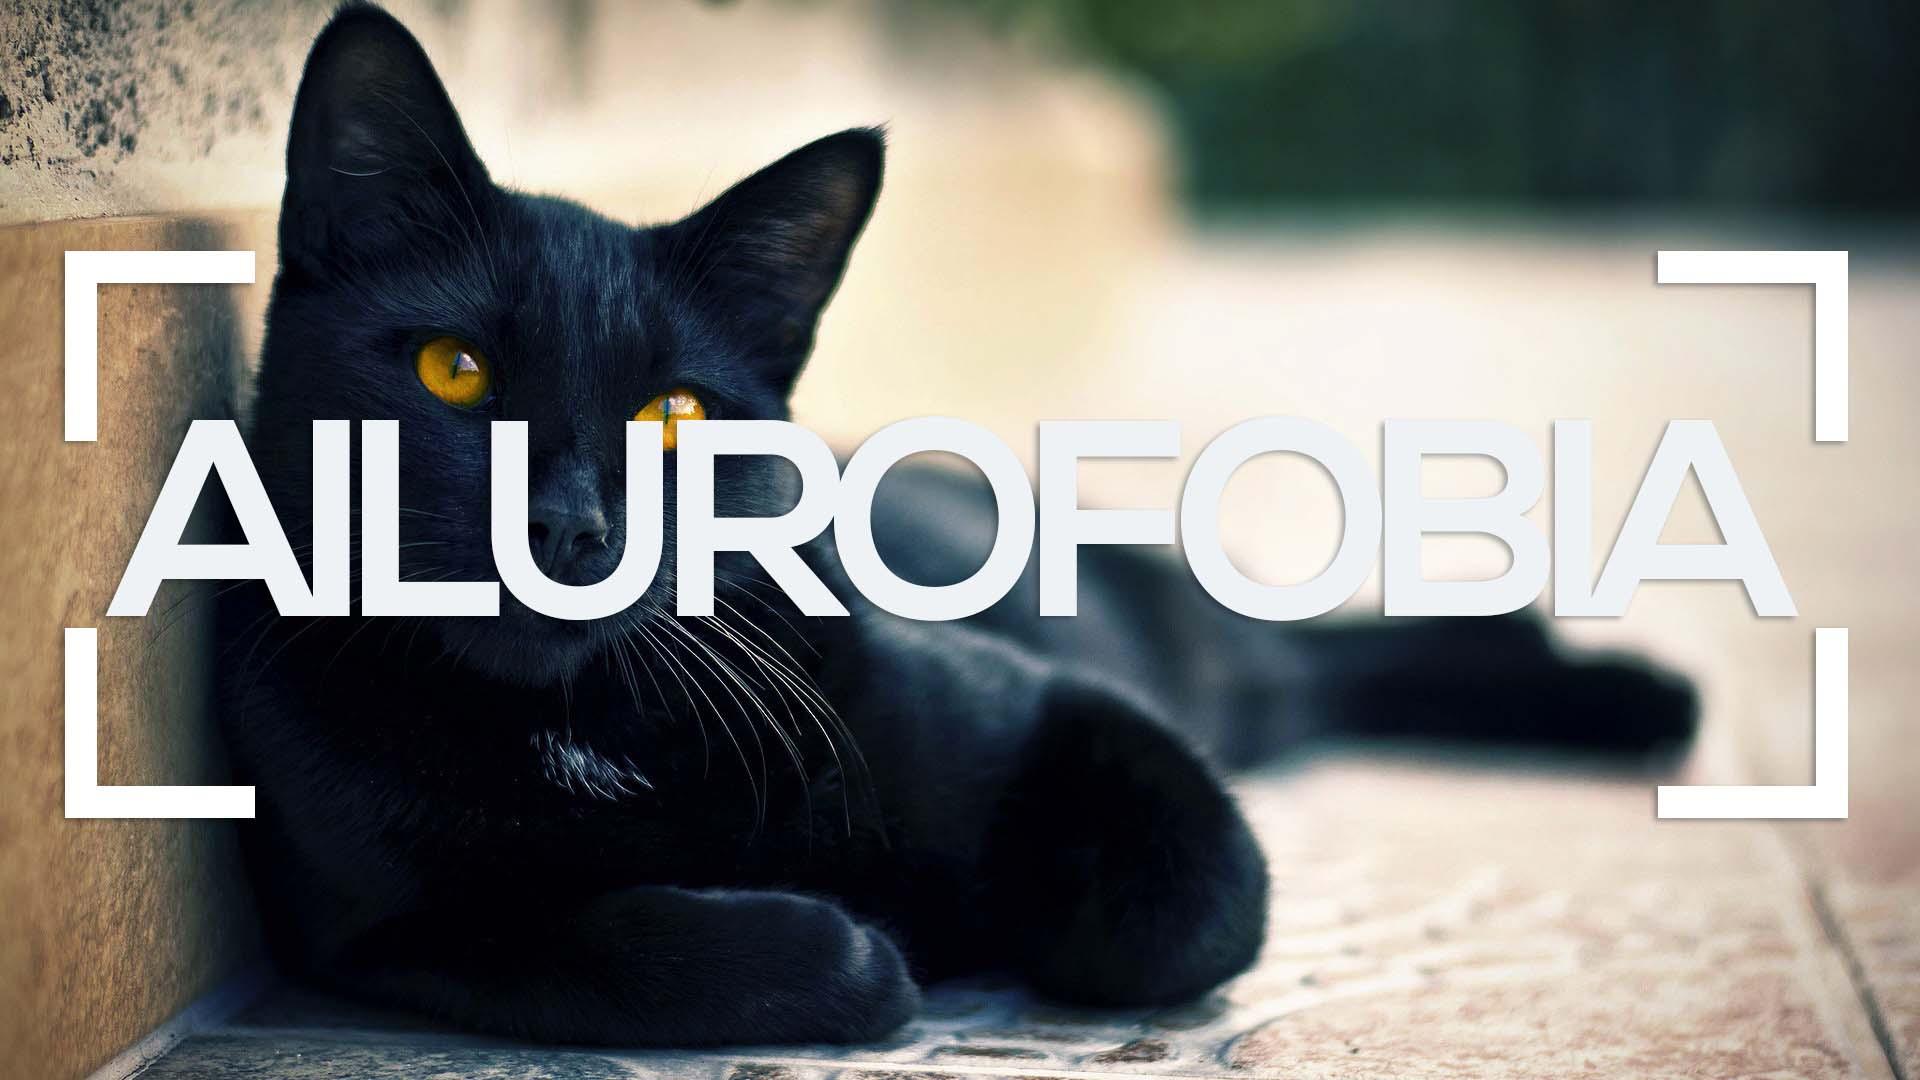 Se muestra un gato negro tumbado y la palabra ailurofobia